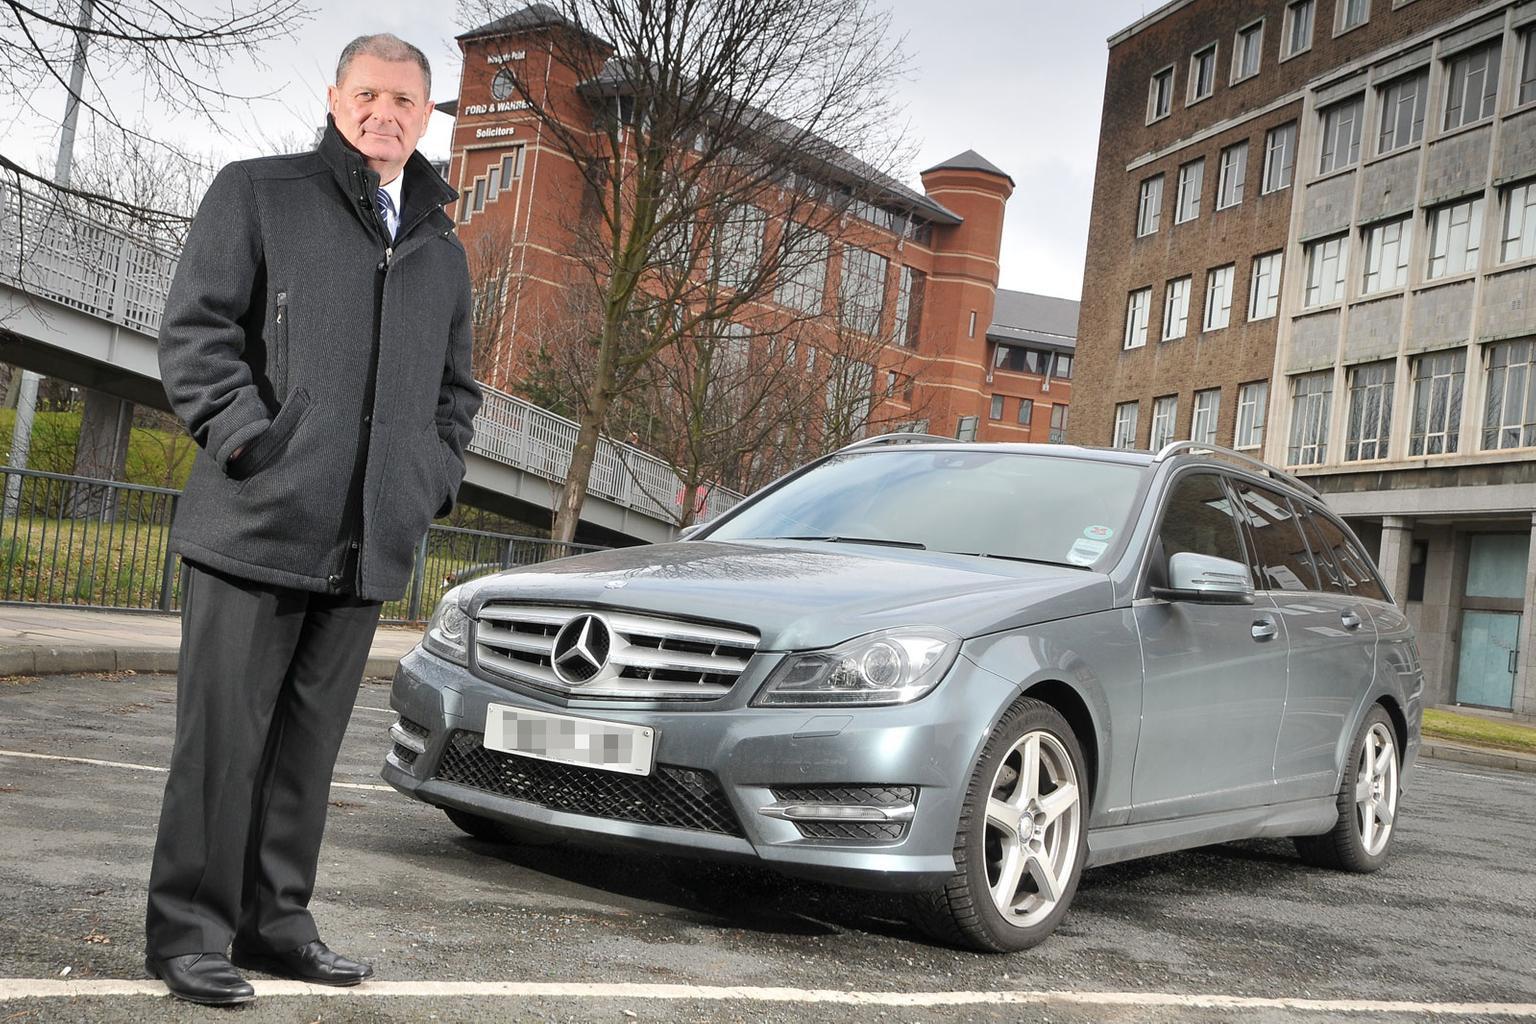 Mercedes-Benz C-Class Estate engine failure